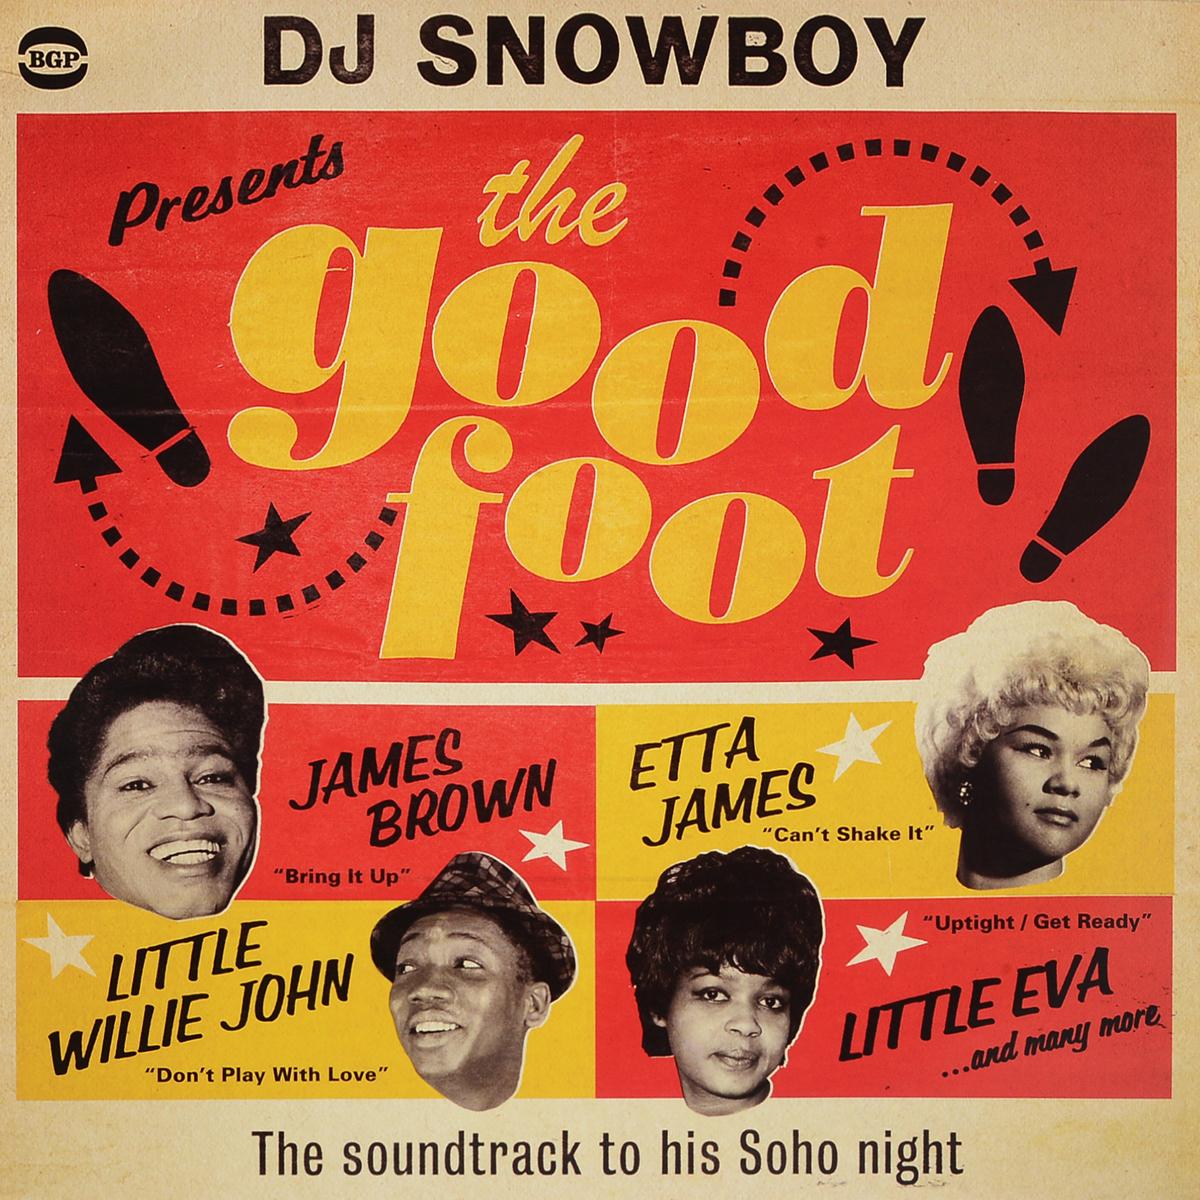 Dj Snowboy Dj Snowboy Presents The Good Foot (2 LP) dj schwede dj schwede fascinated maxi single lp